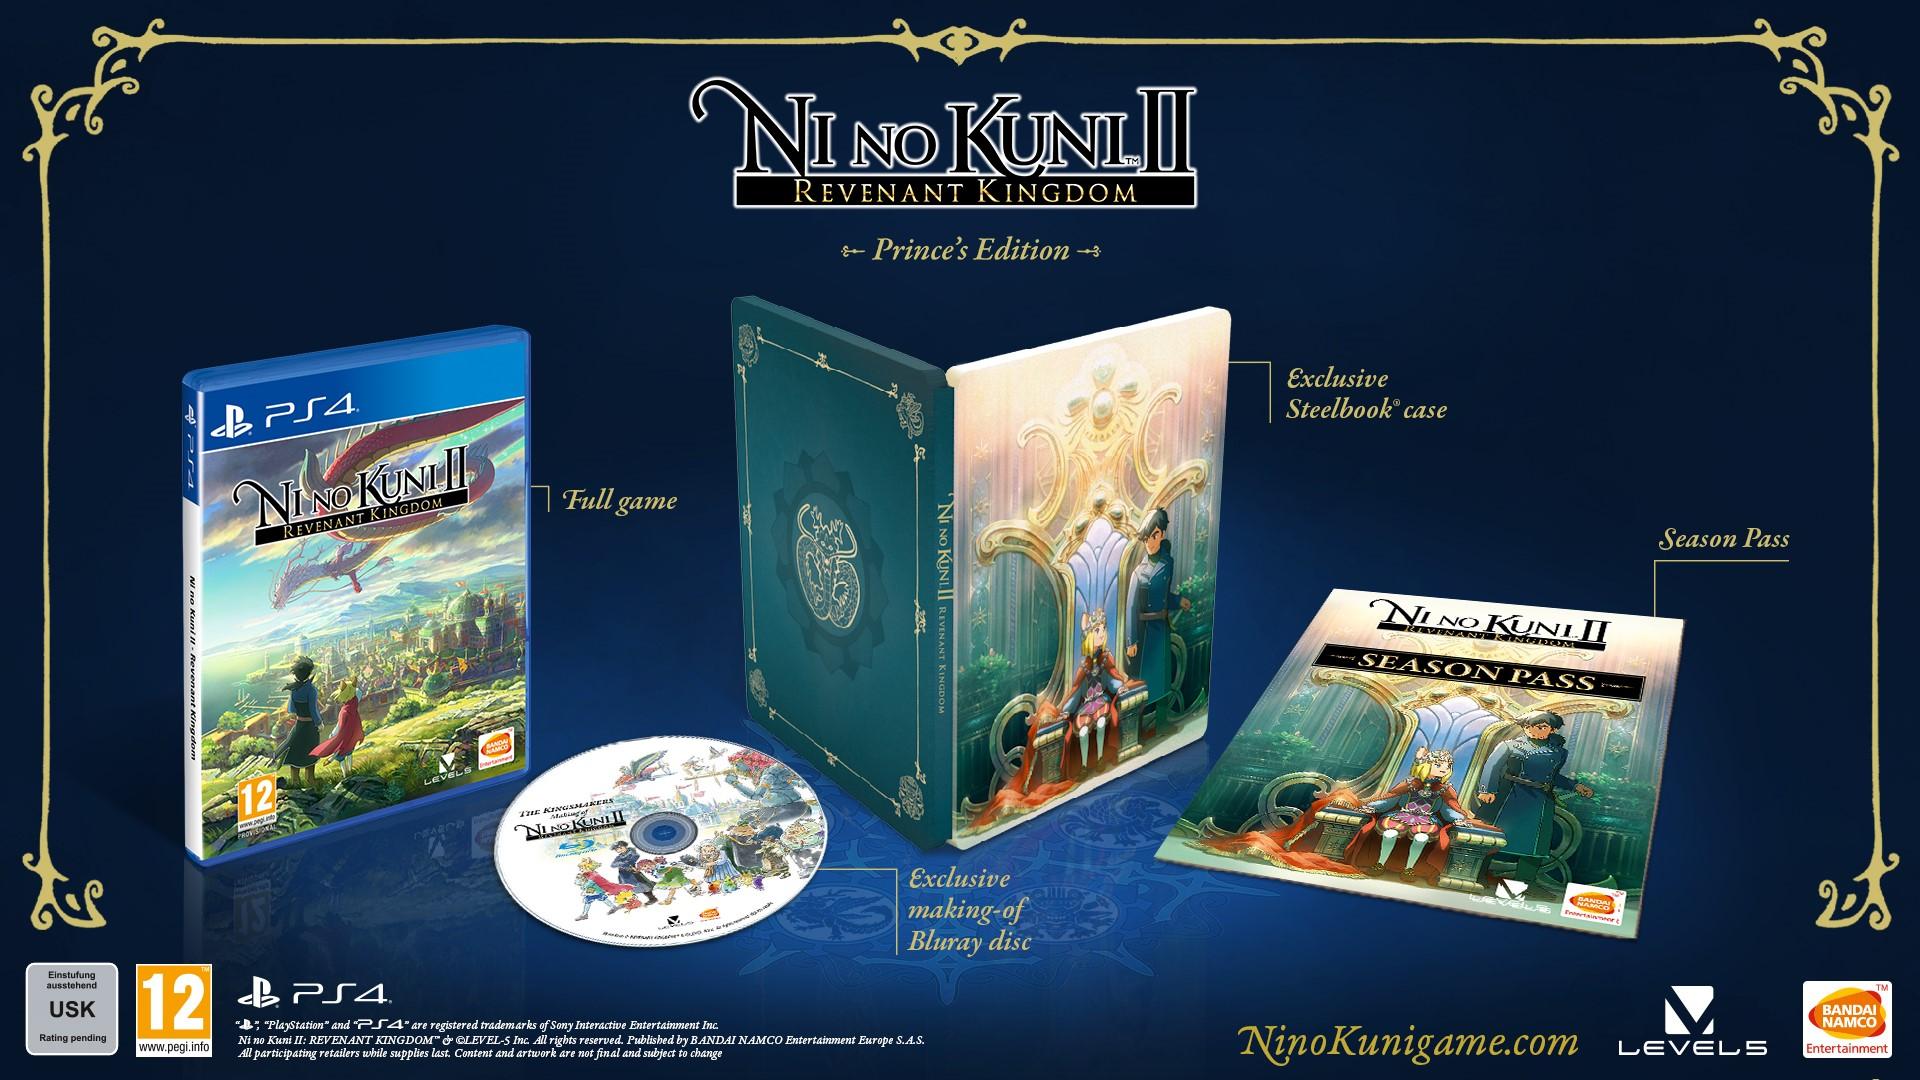 [2018-01-19] Ni no kuni 2 revenant kingdom - PS4 - PC 1502202851-4728-artwork